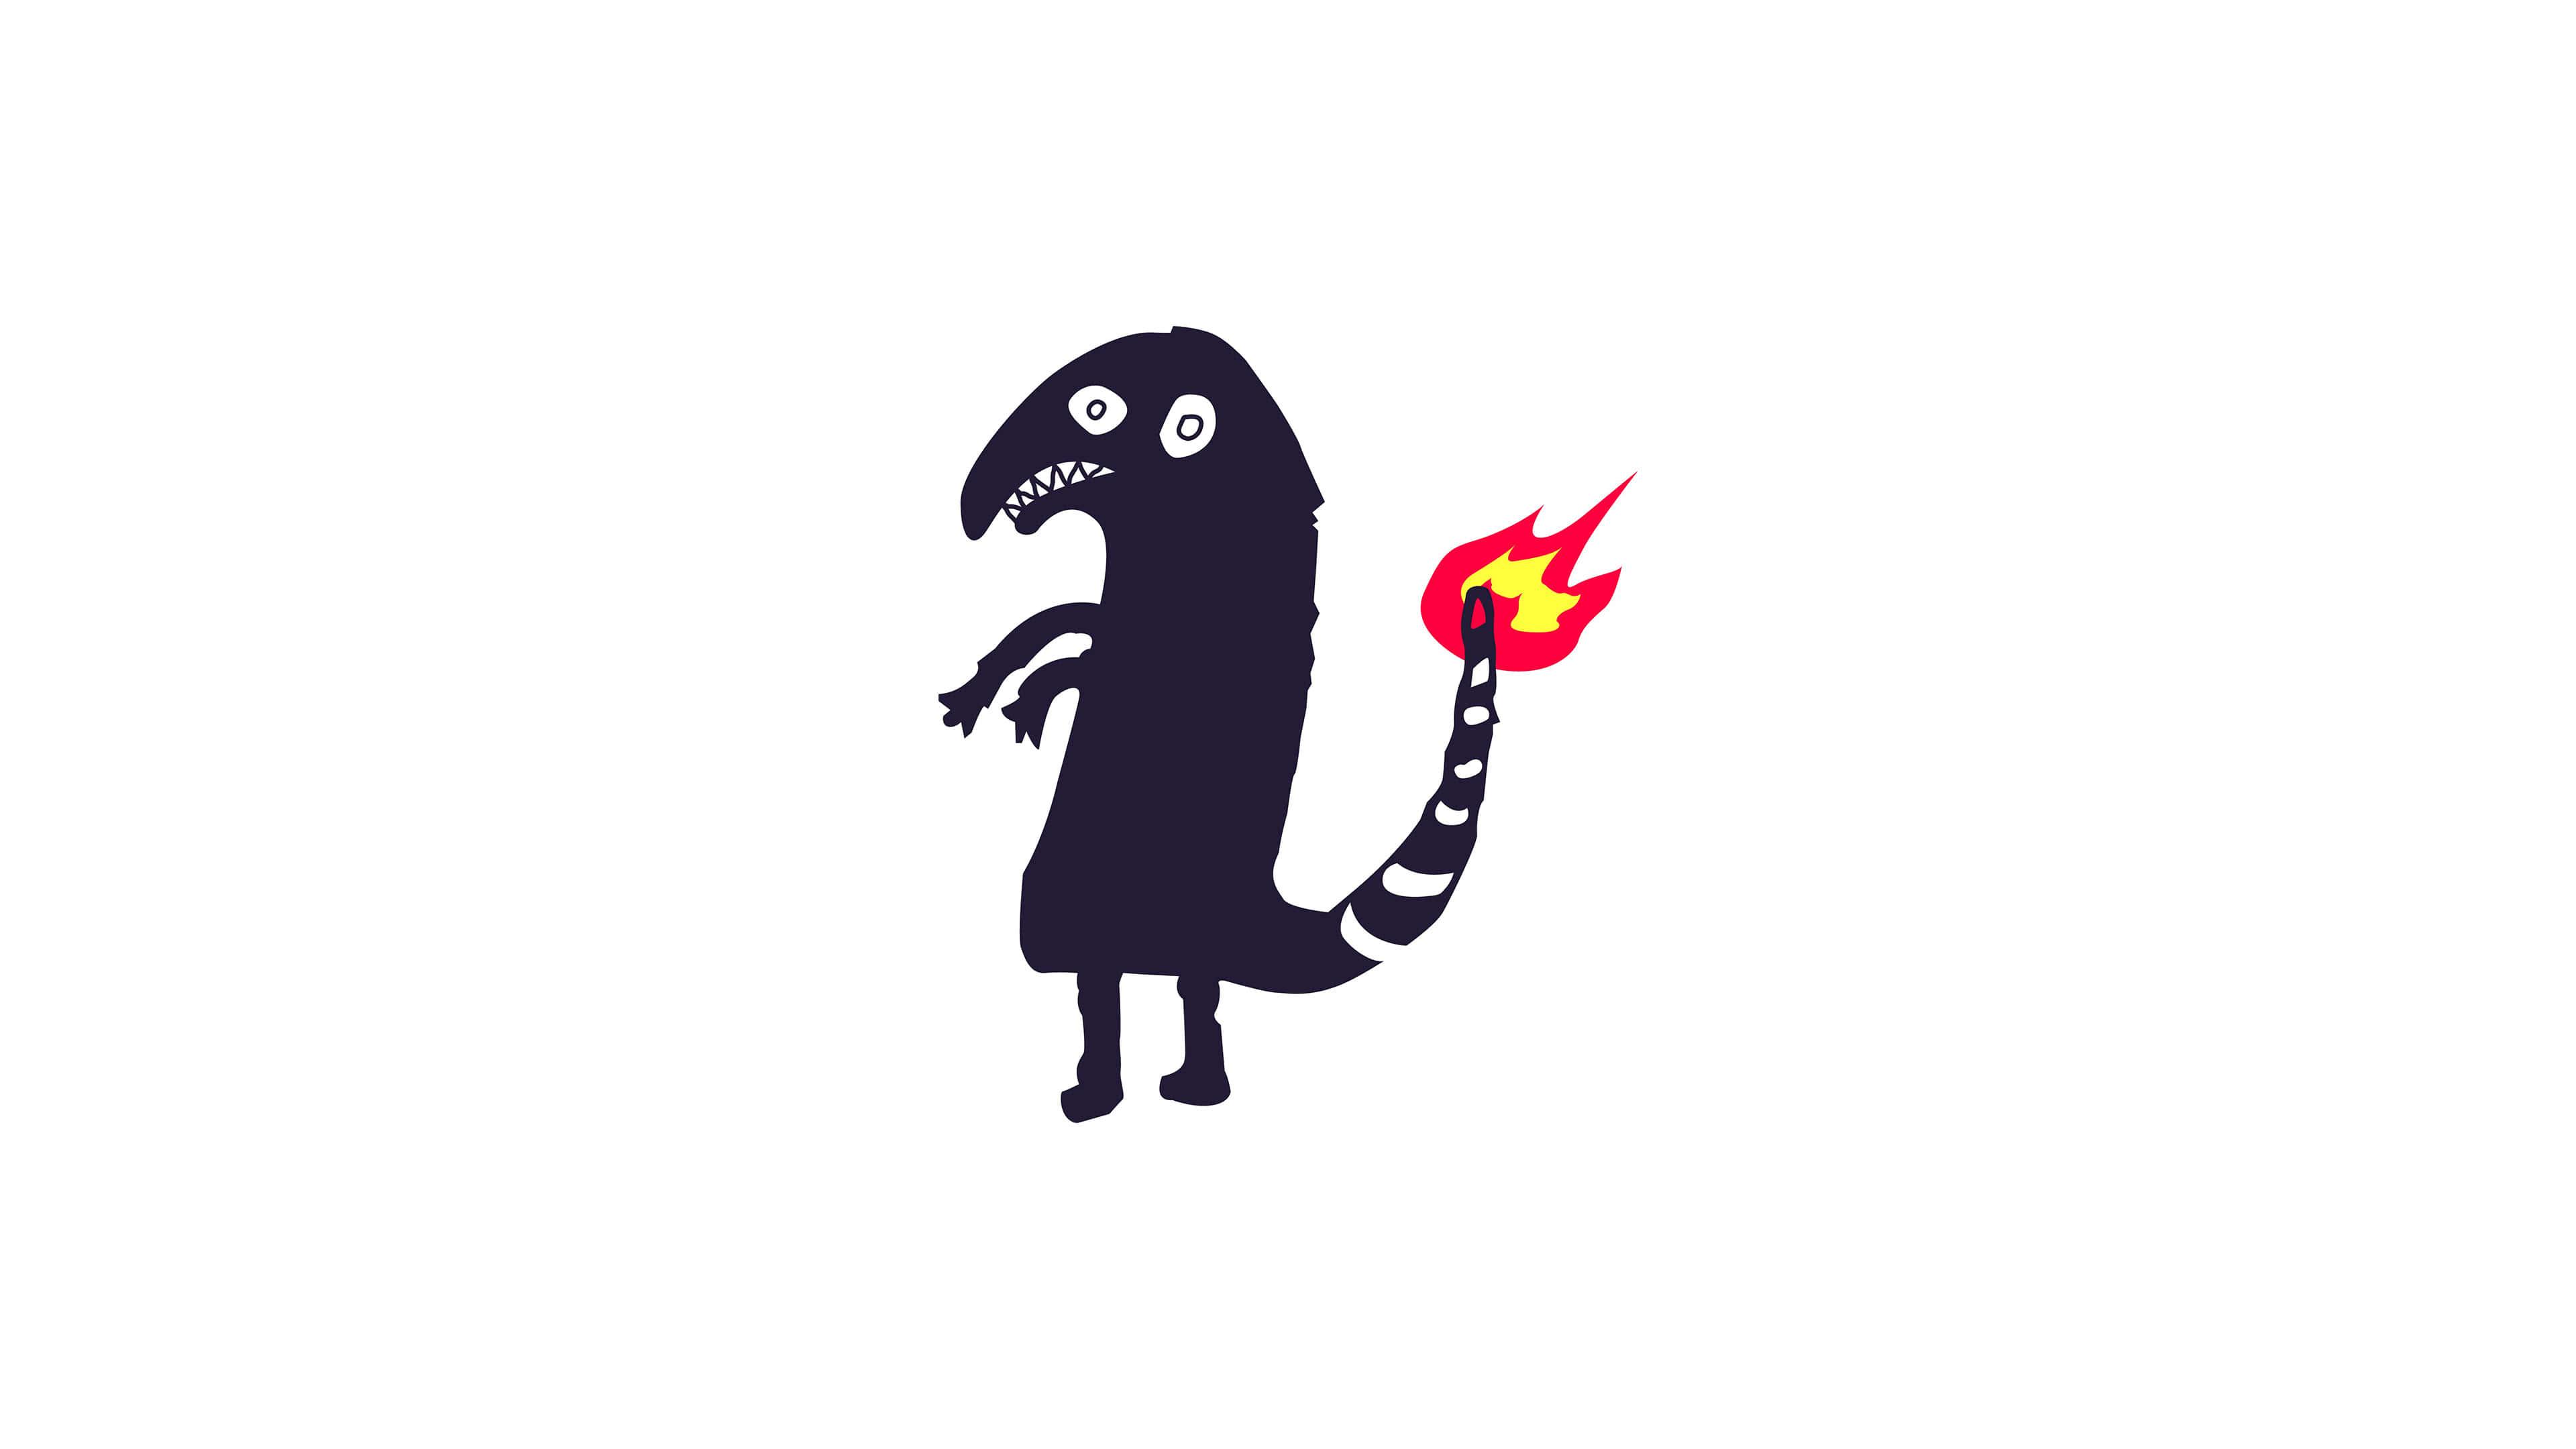 pokemon charmander drawing meme uhd 4k wallpaper